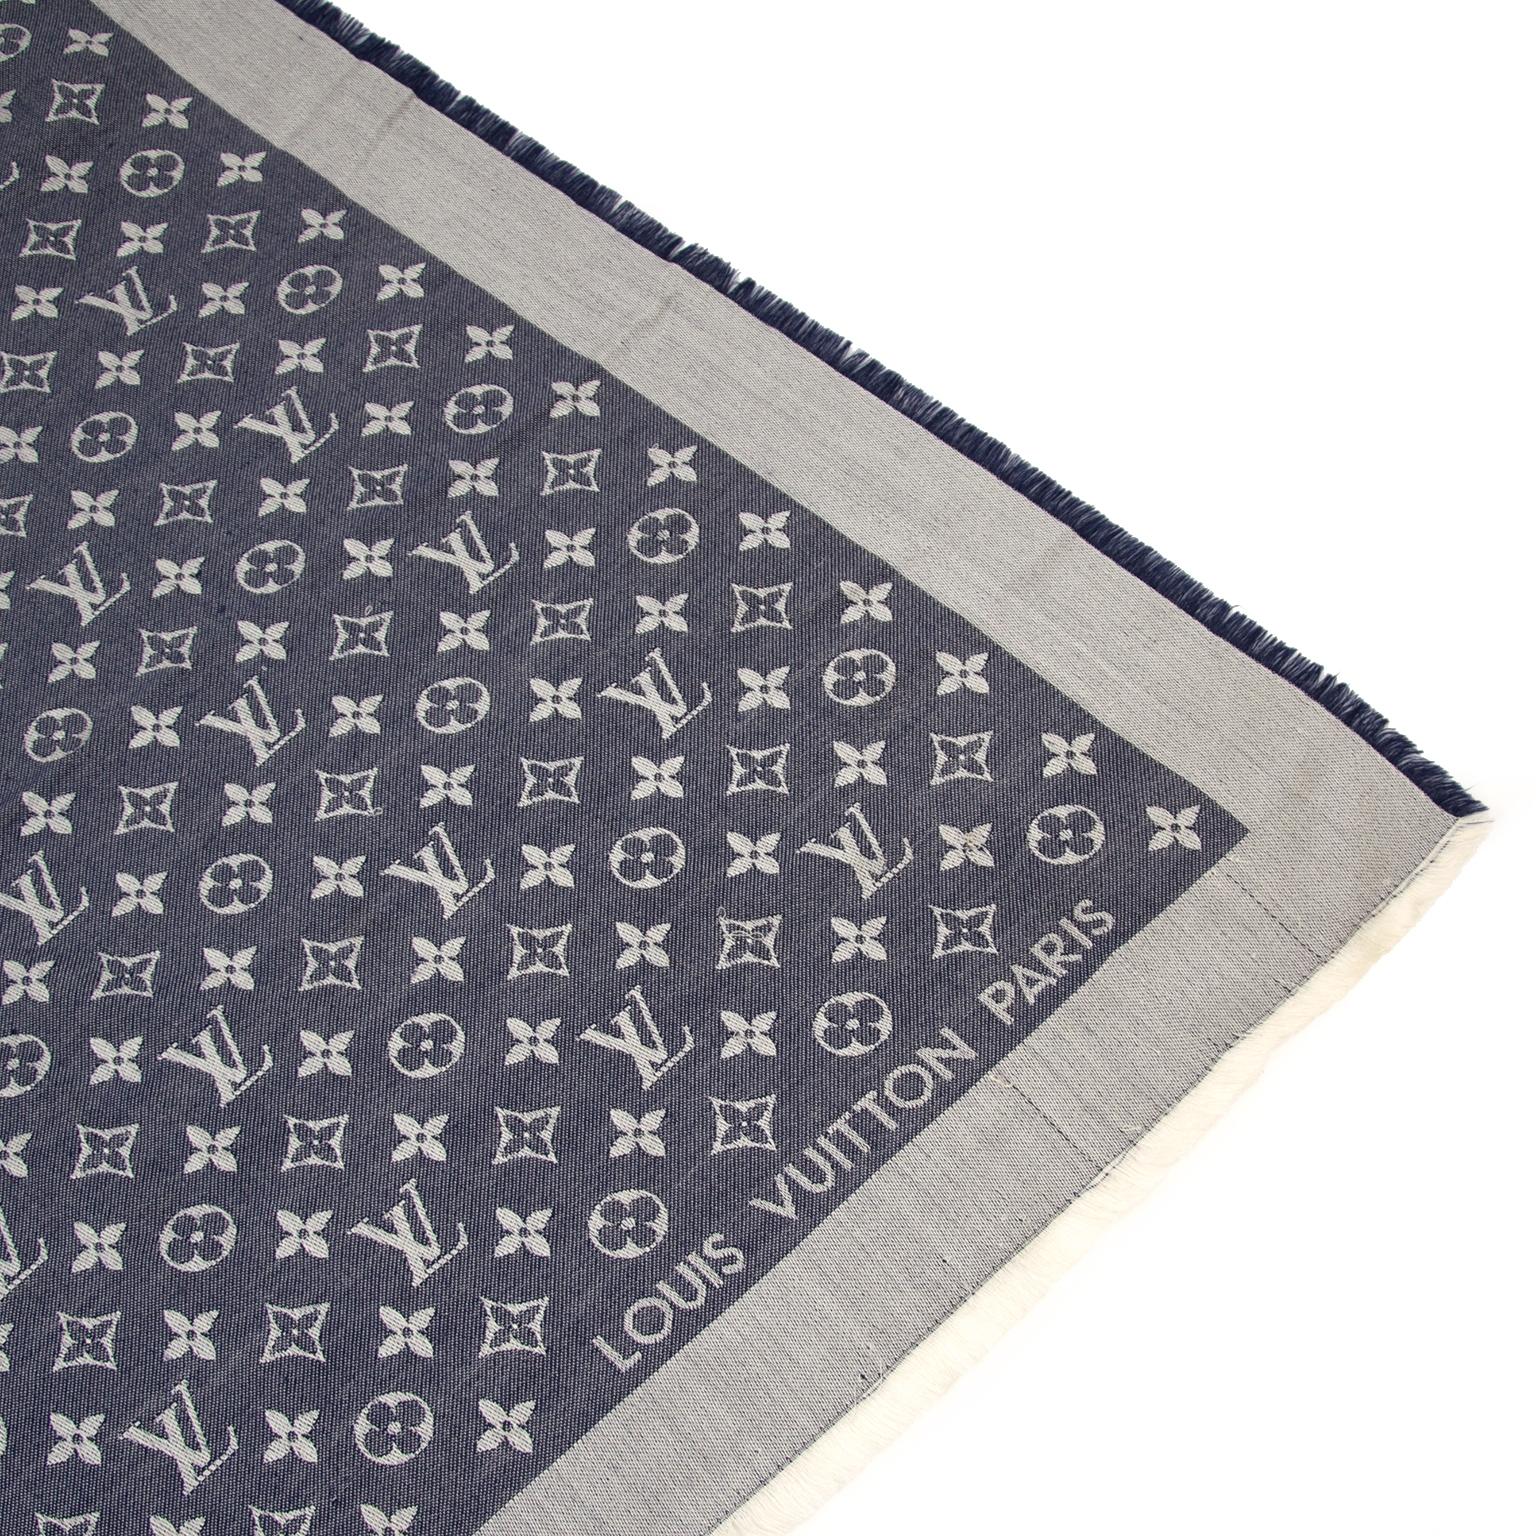 Koop uw authentieke Louis Vuitton Denim Monogram Shawl